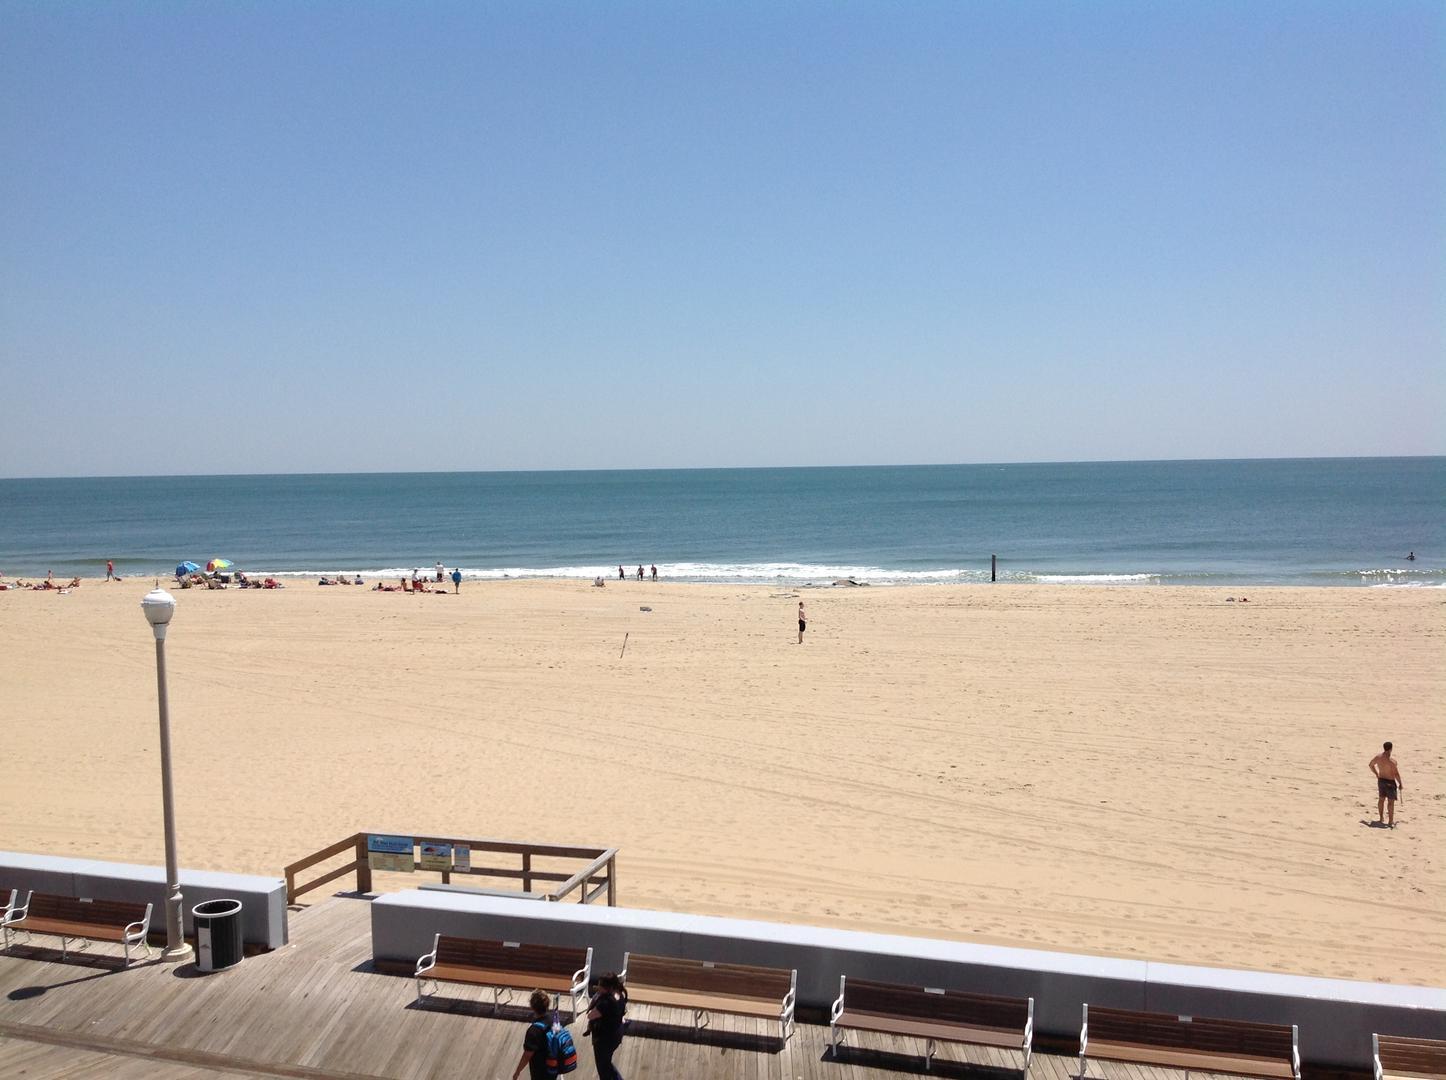 Oceans Mist, 301 - Balcony View